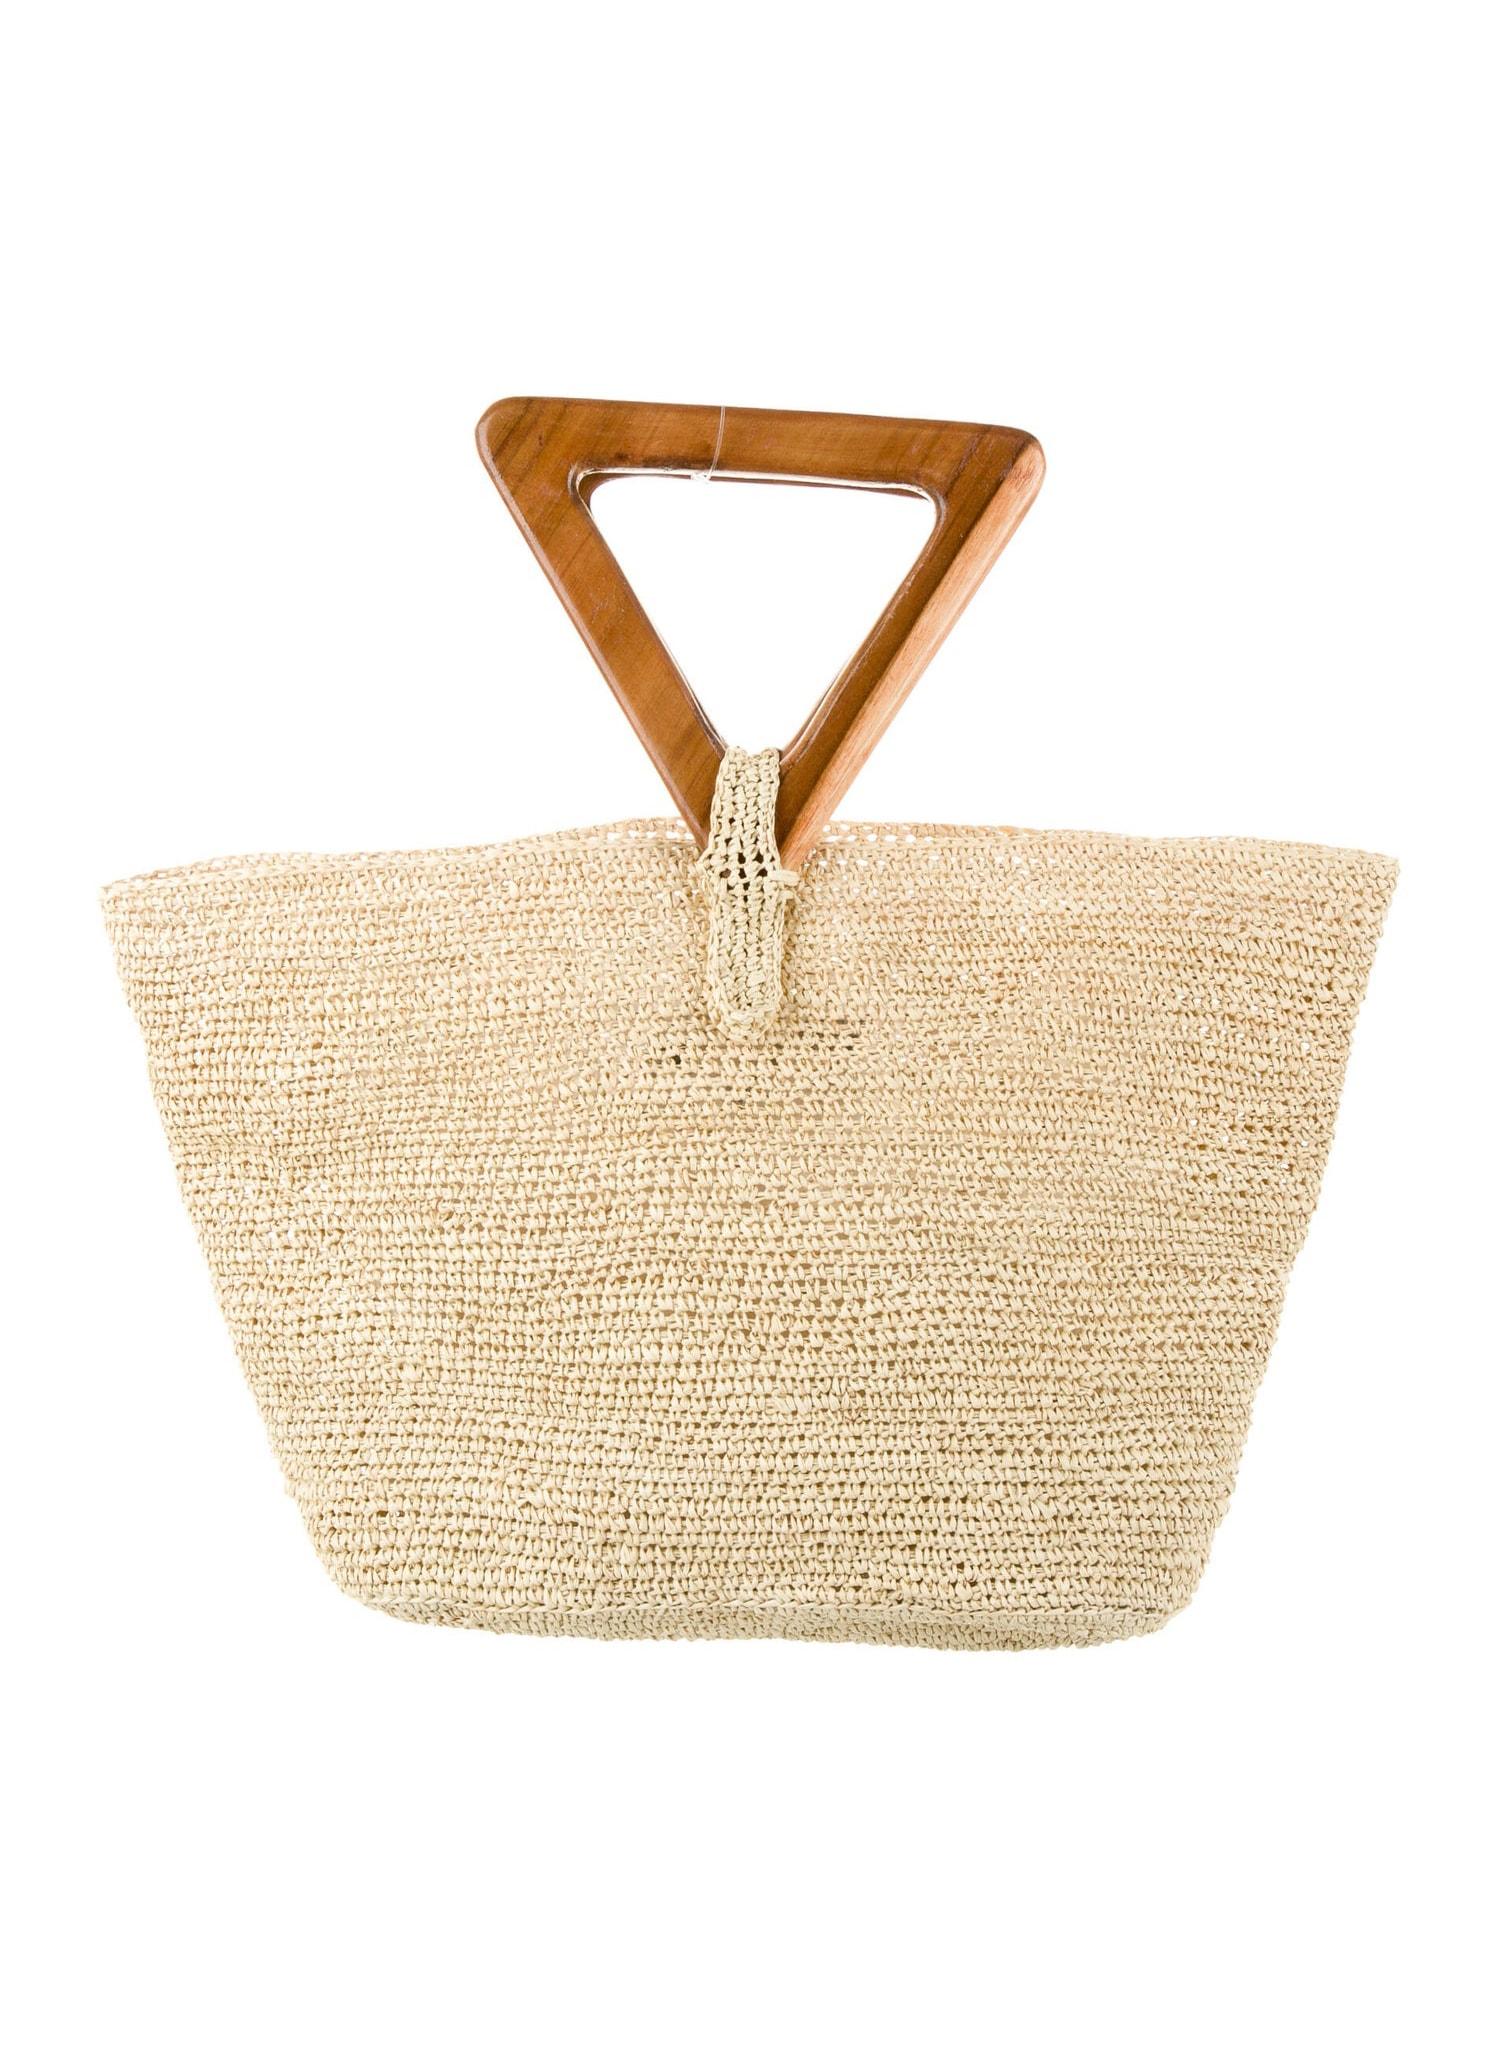 MARINA Woven Straw Handle Bag